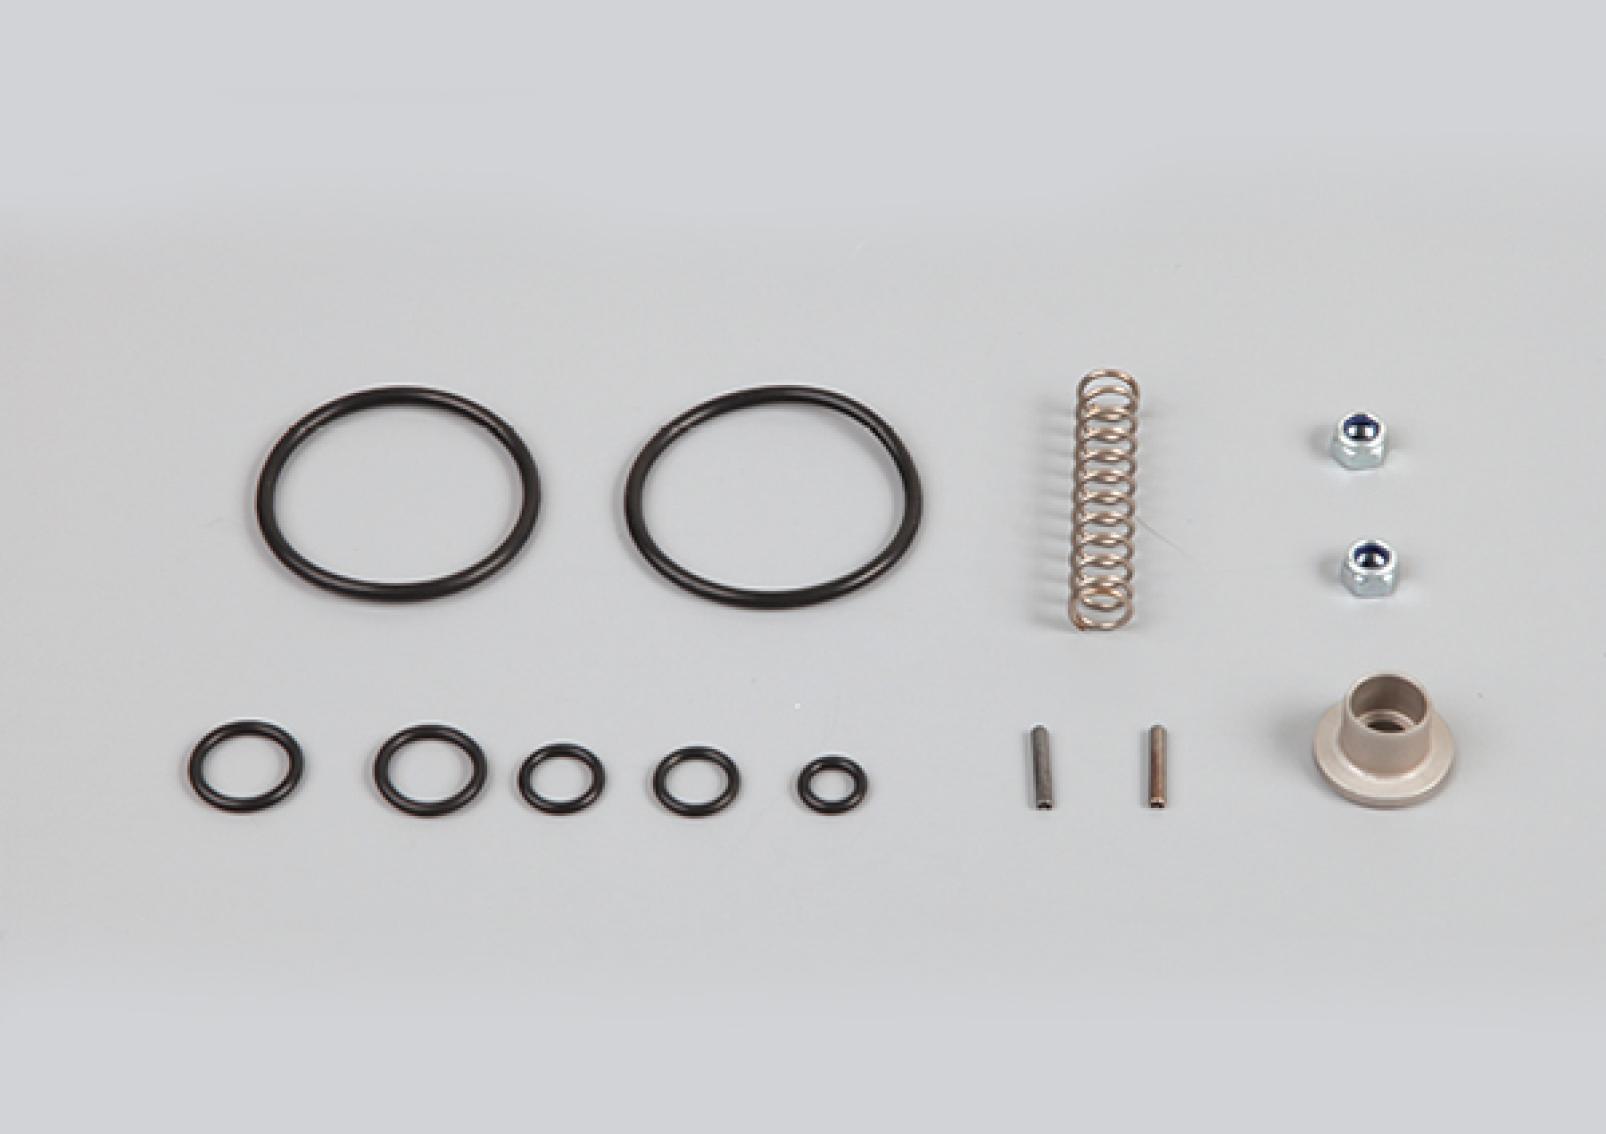 Hand Brake Valve Repair Kit, 961 723 001 2